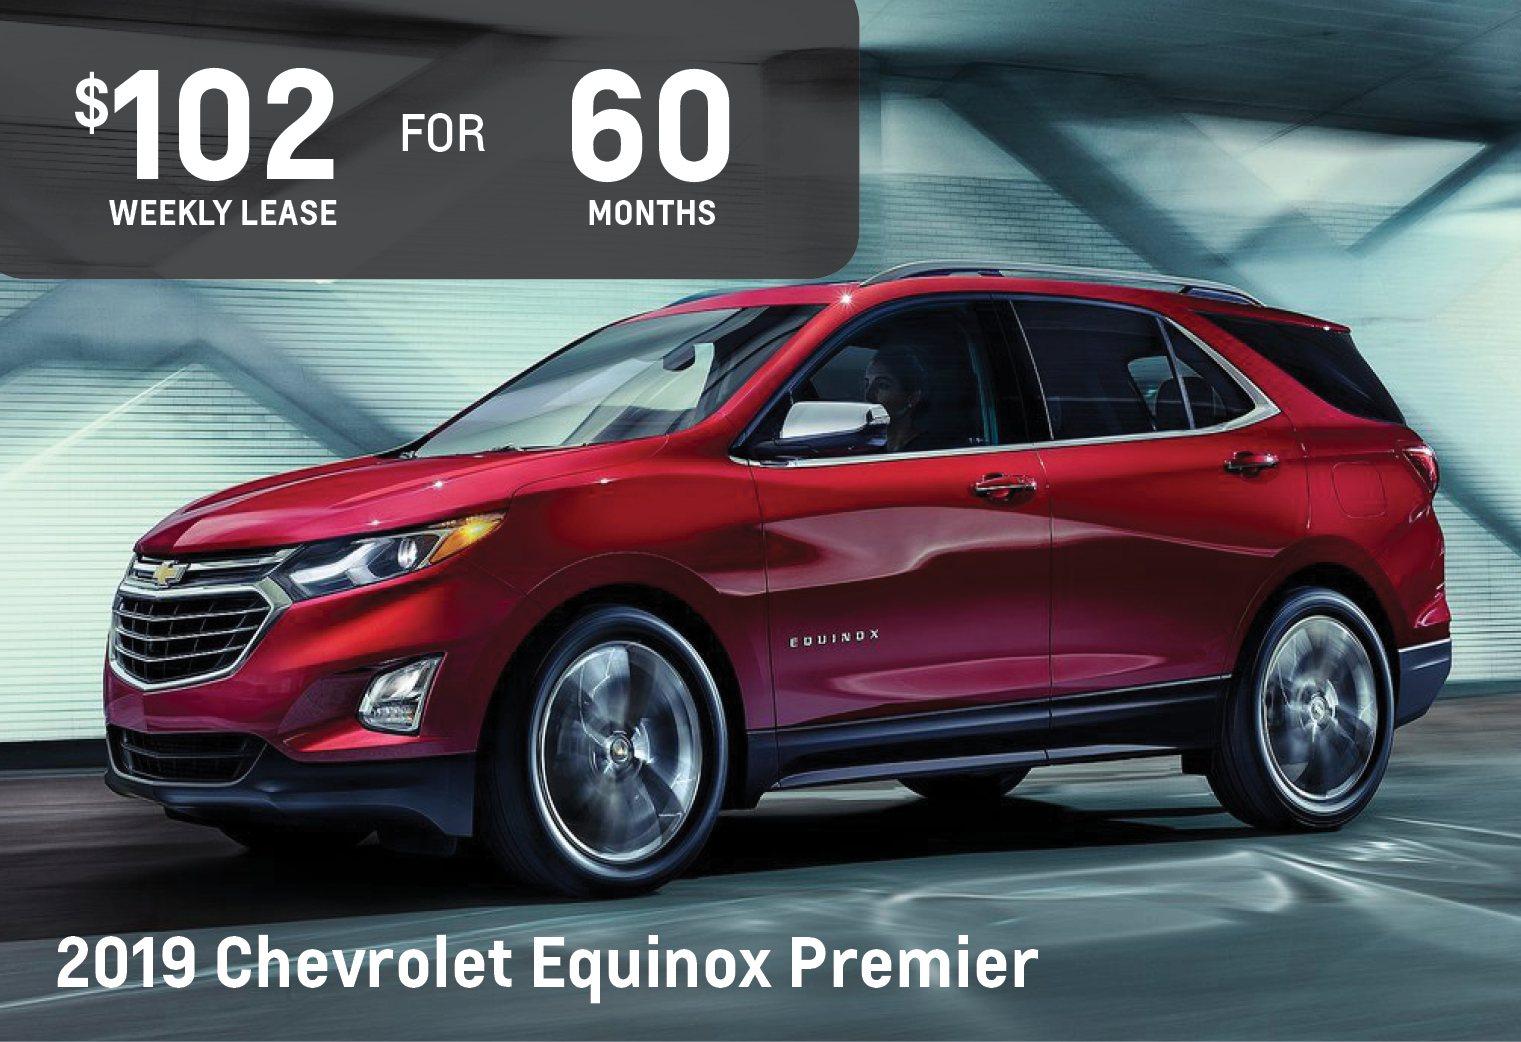 August 2019 Chevrolet Equinox Sale - Ontario Motor Sales